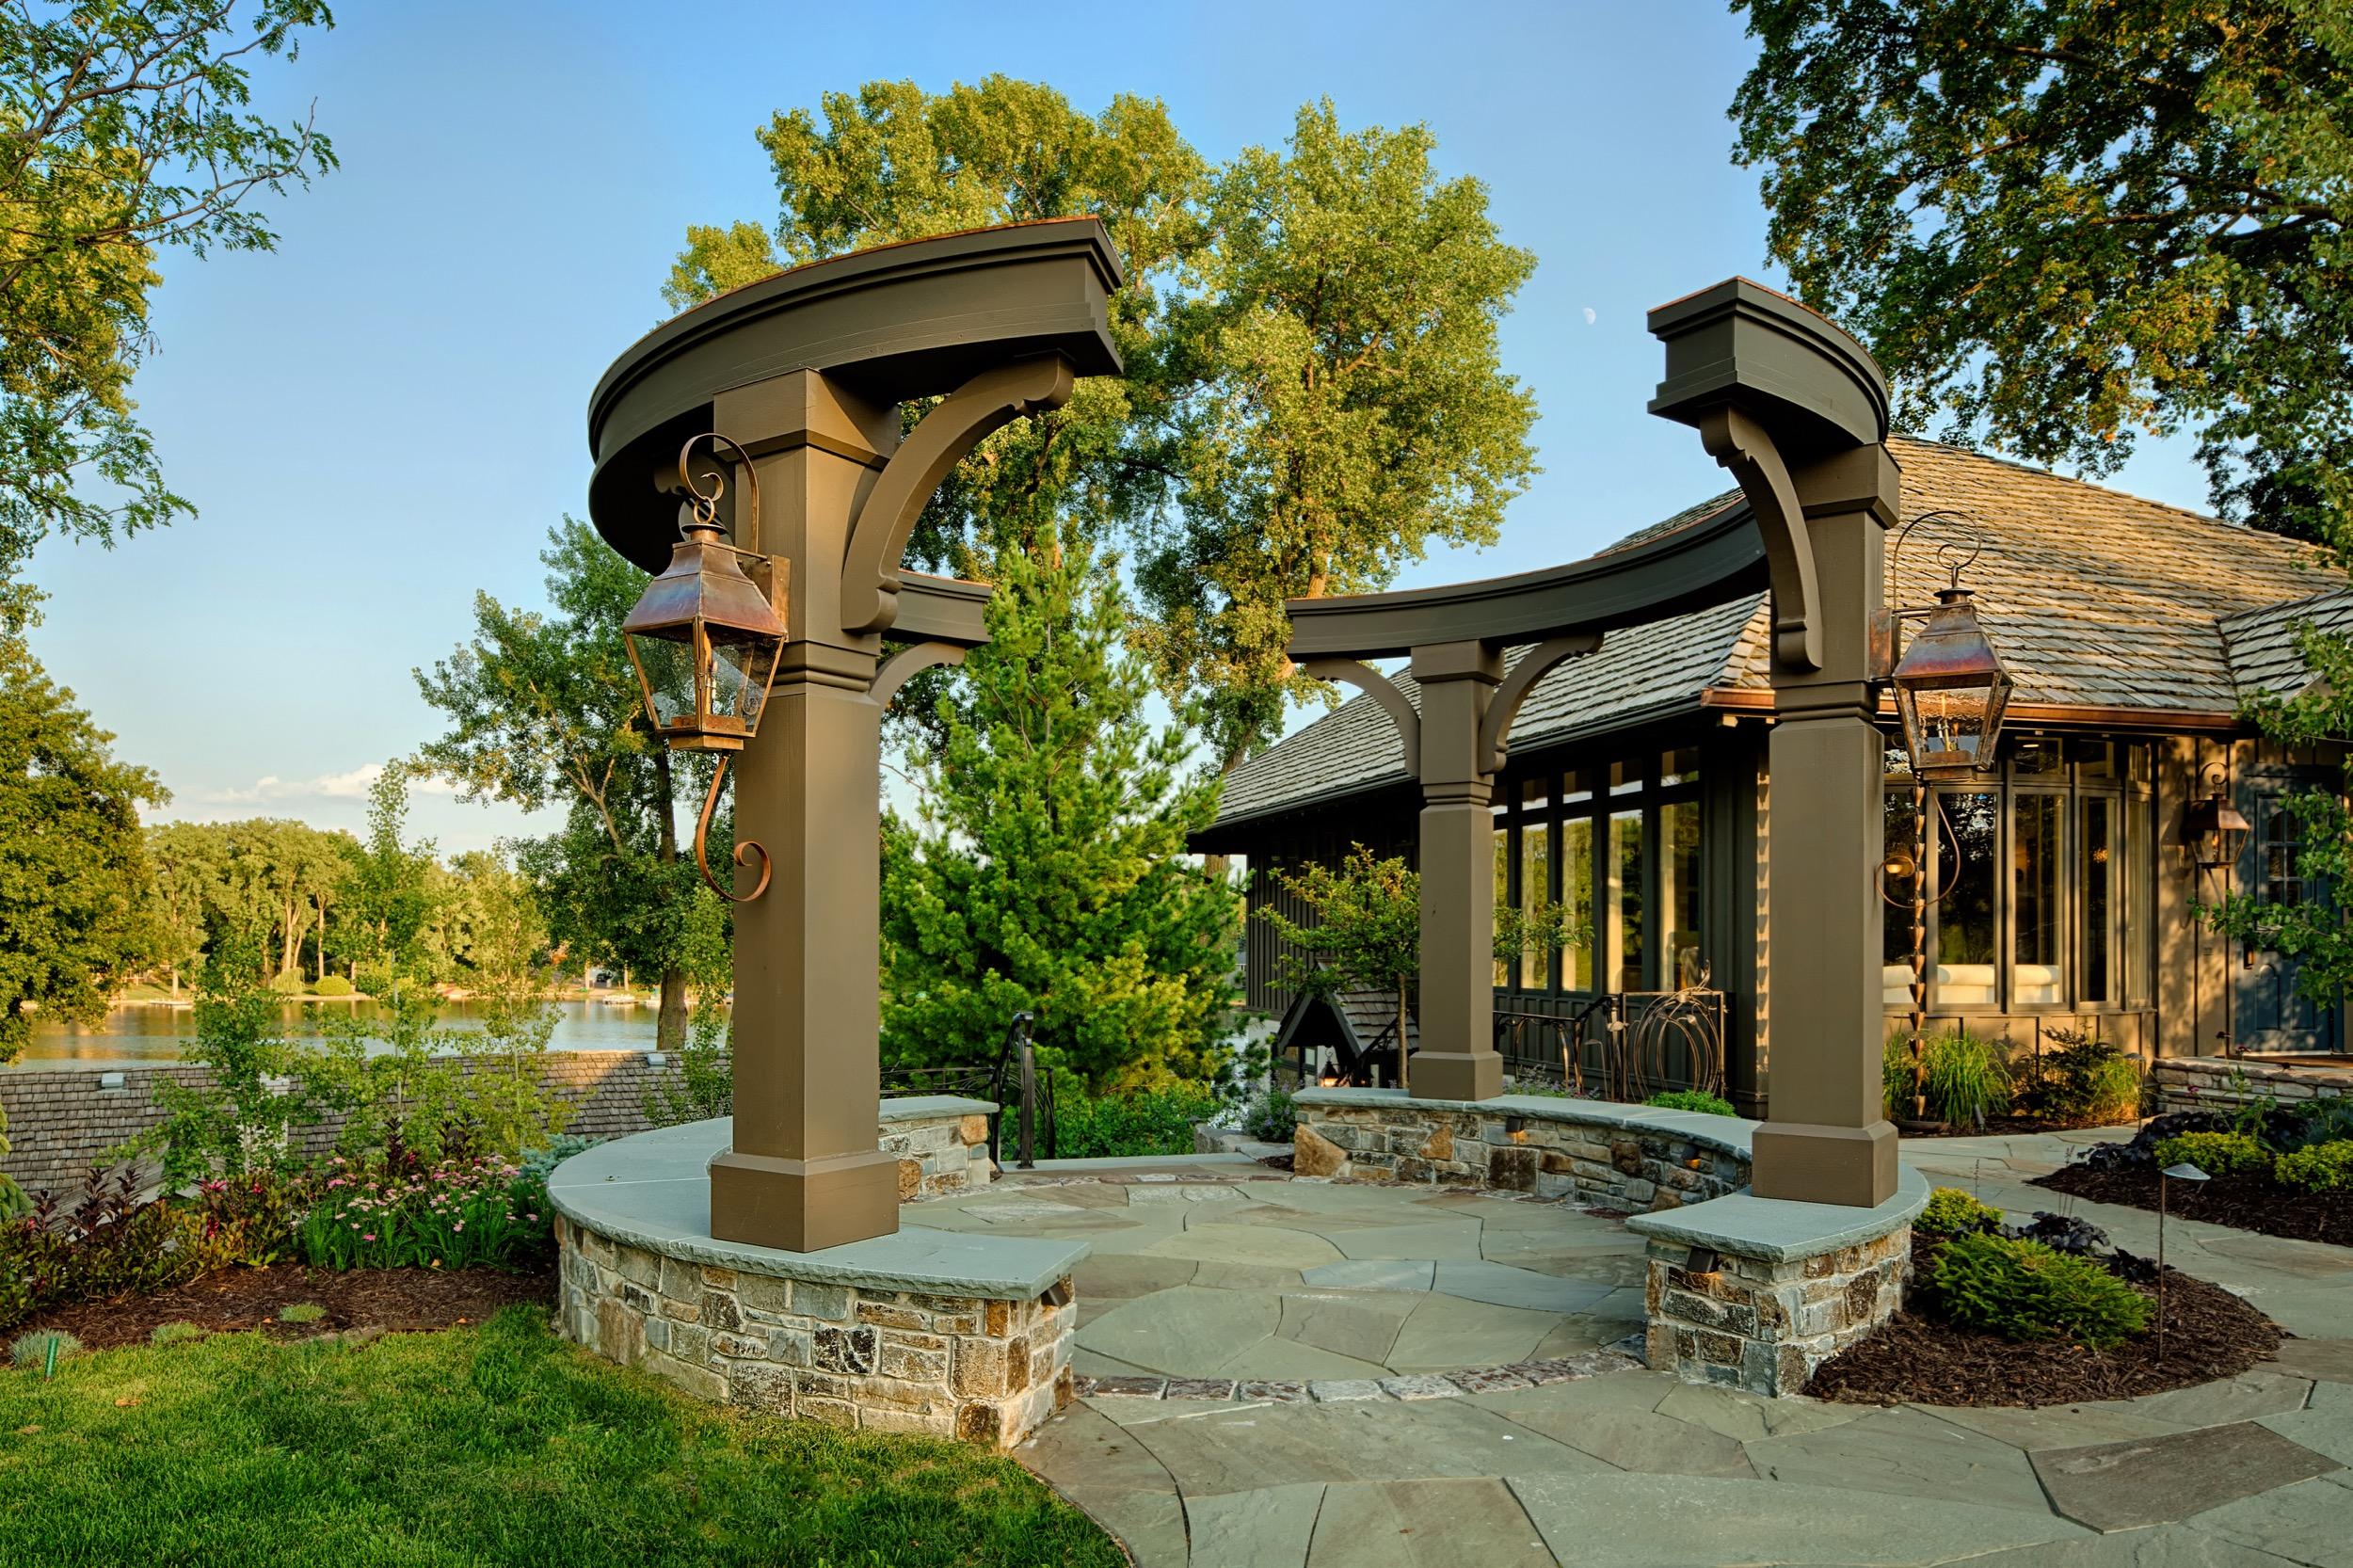 Pergola is a portal to the Lake House path.